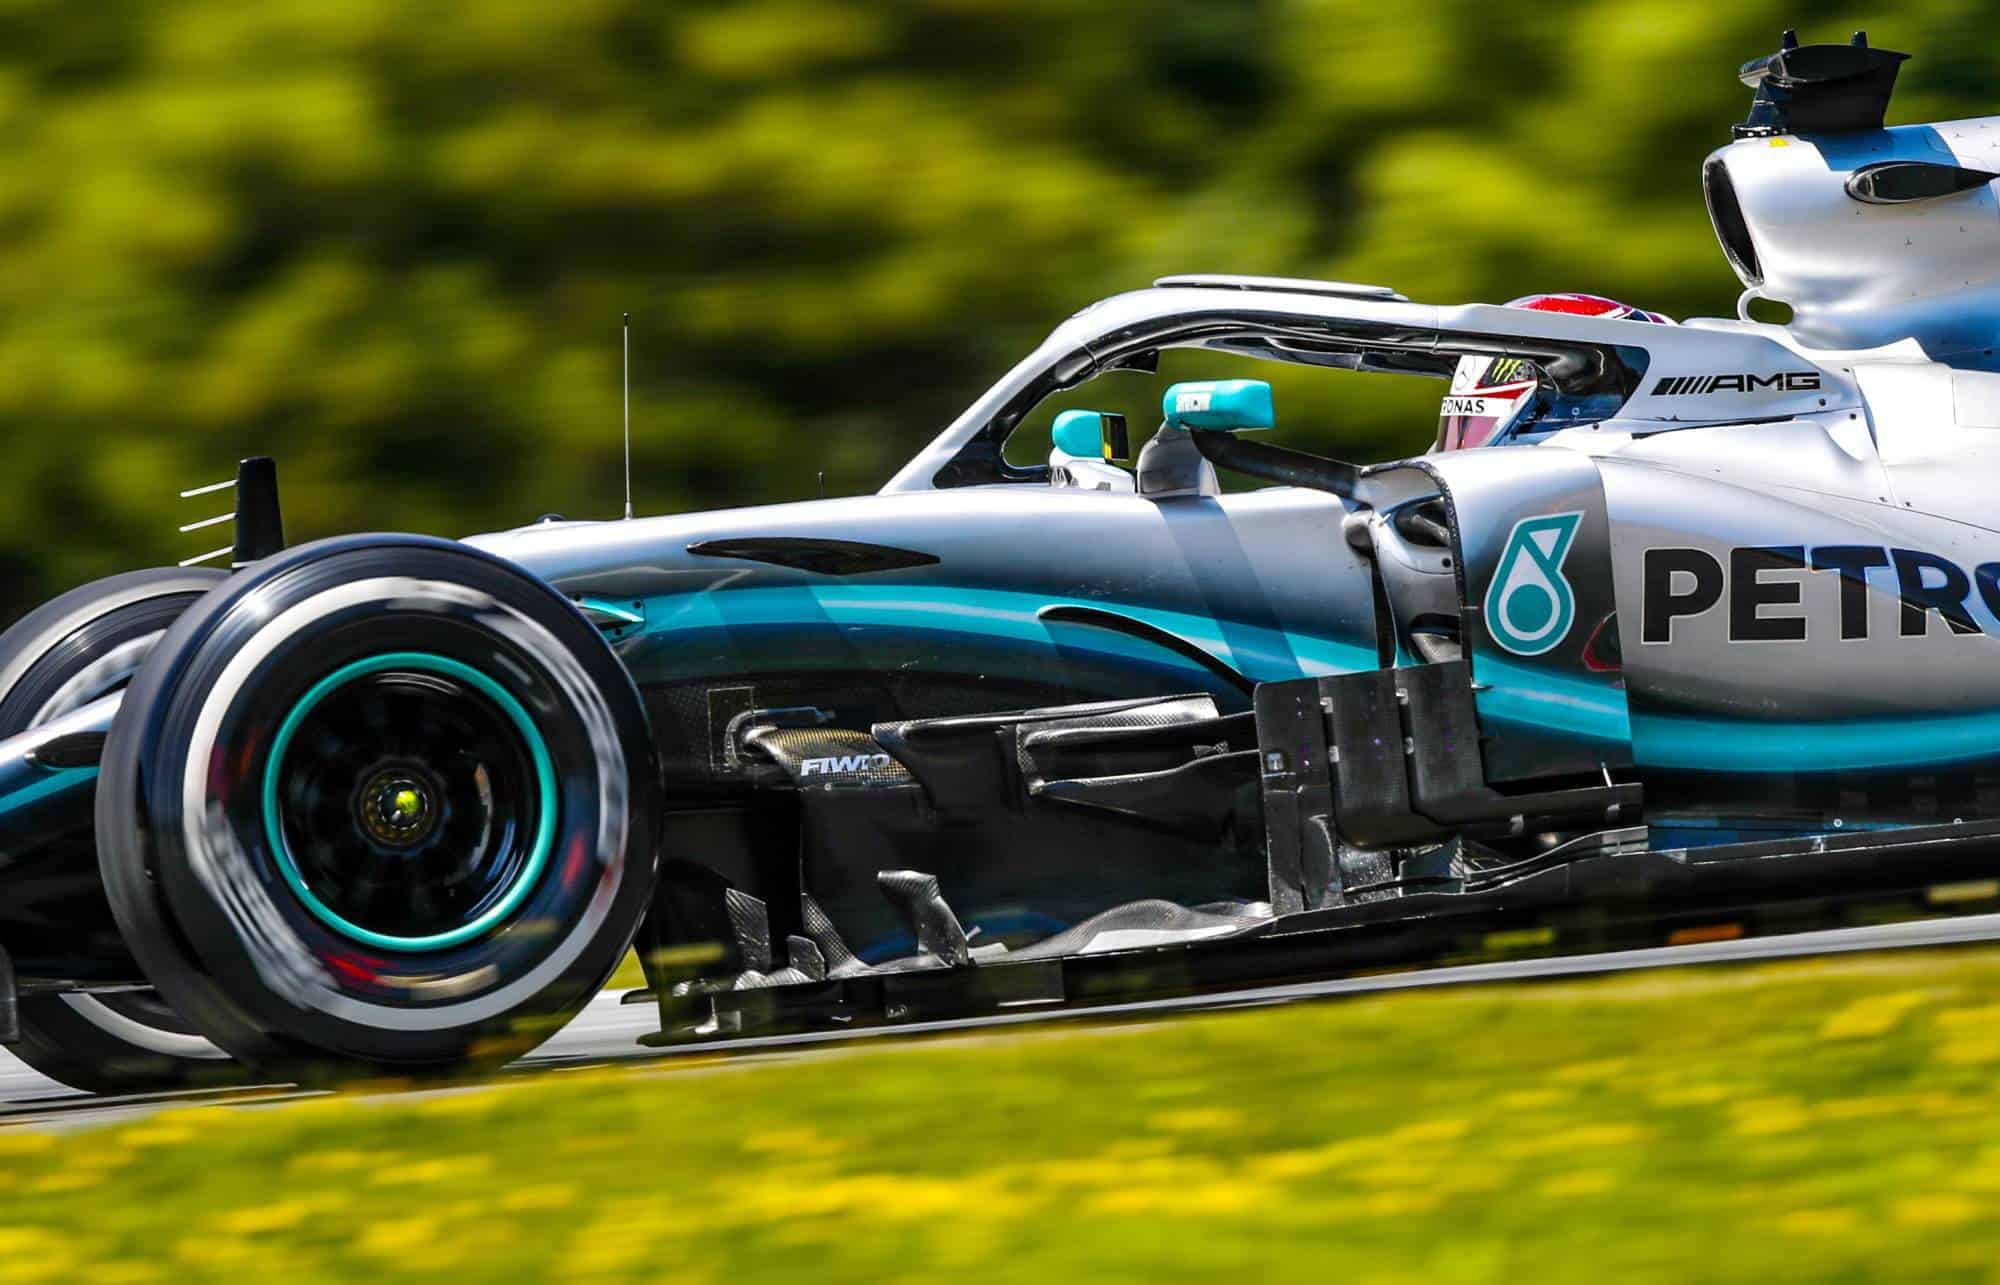 Hamilton Mercedes F1 W10 Austrian GP F1 2019 side view Photo Daimler